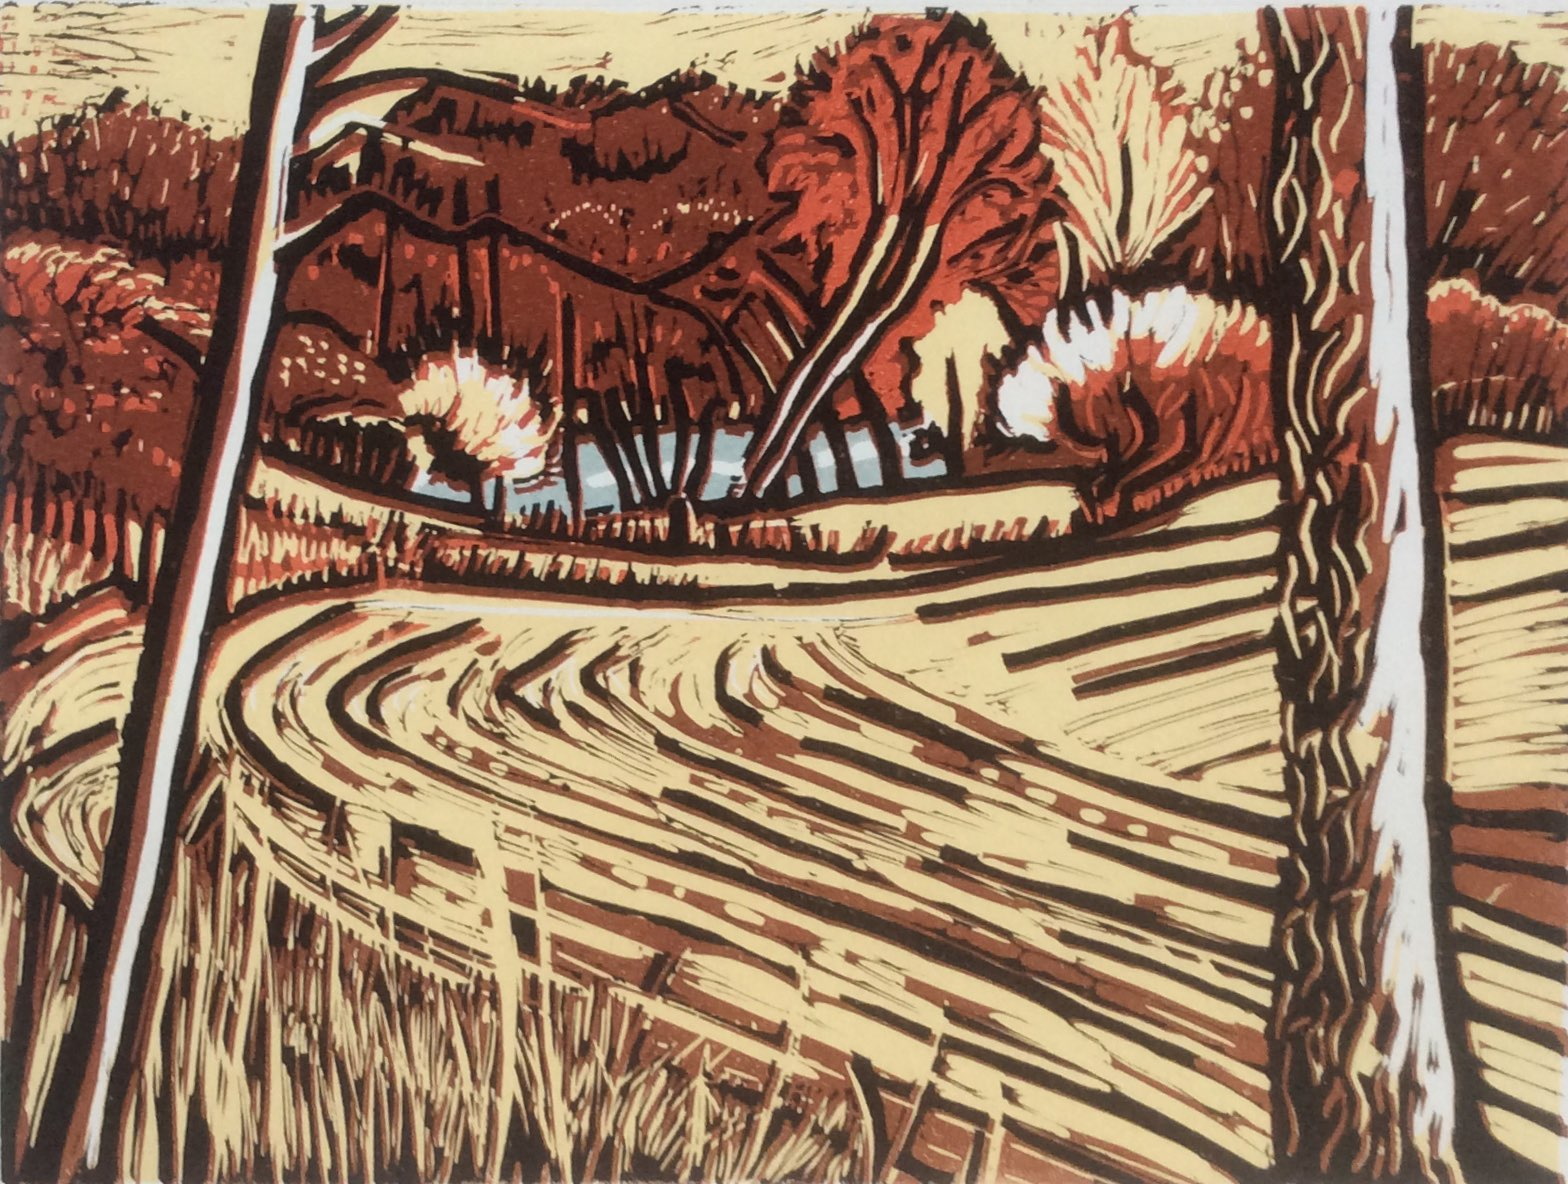 Fonthill Lake lino print 26x36